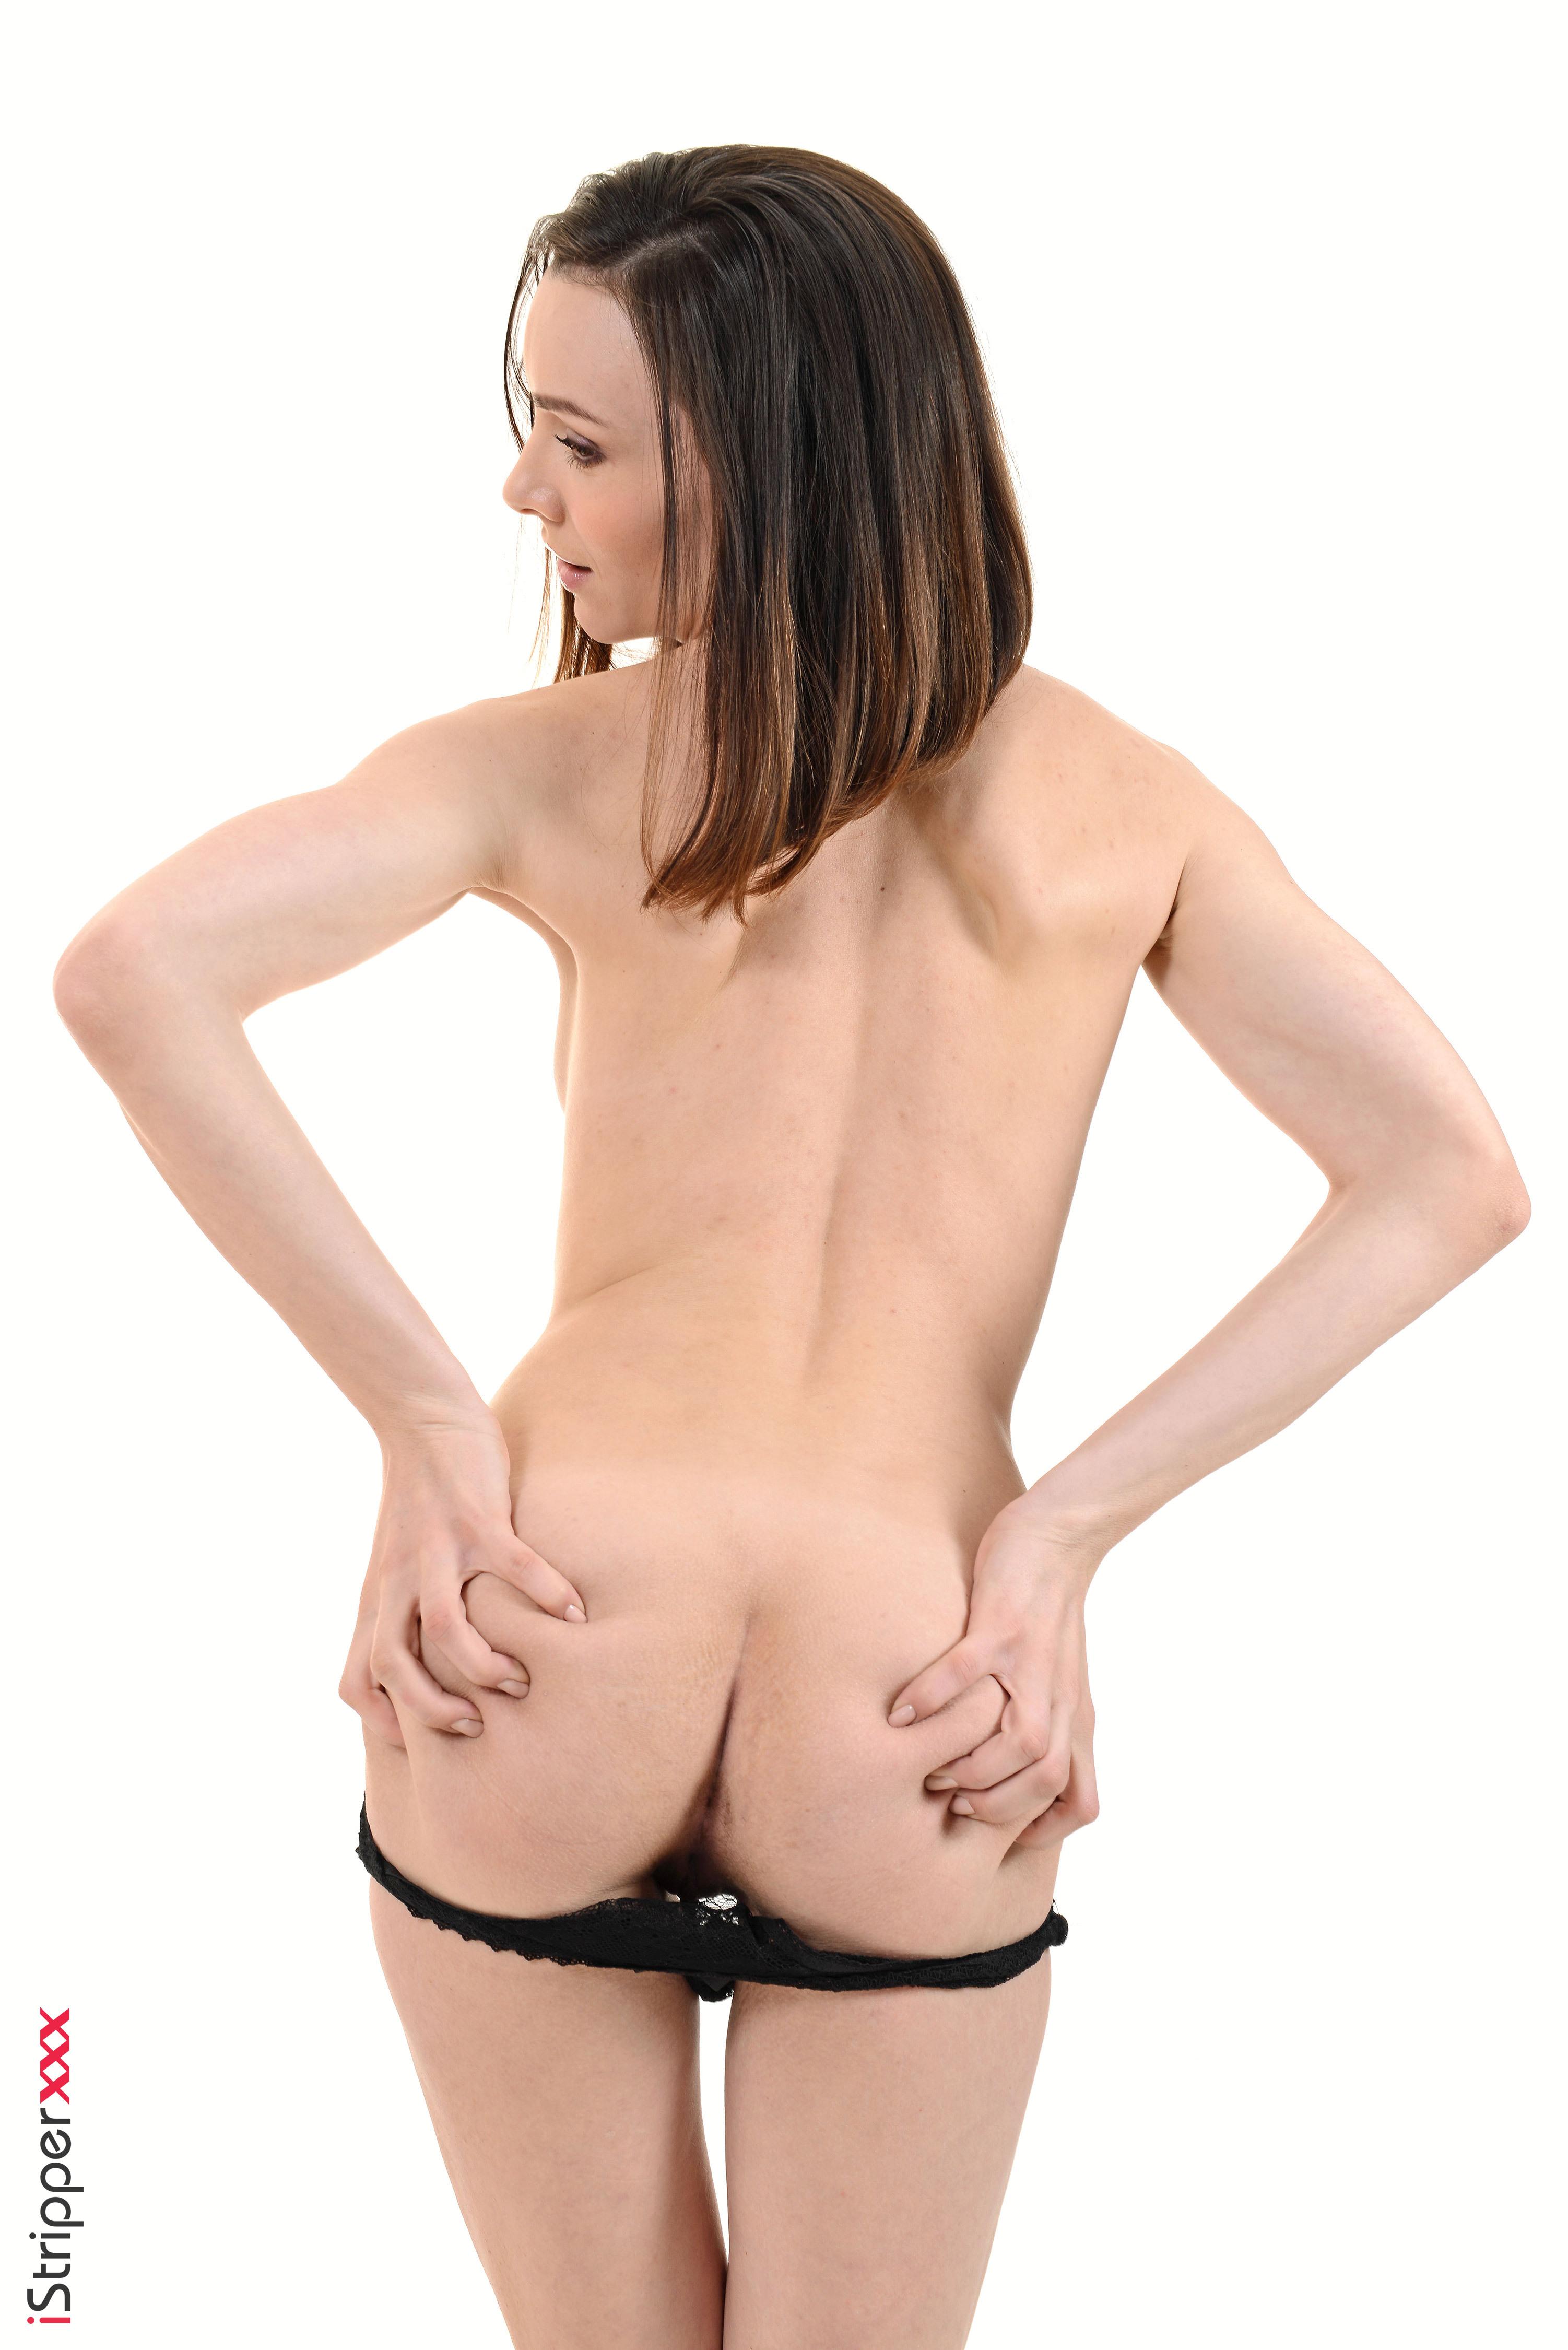 amateur girls stripping